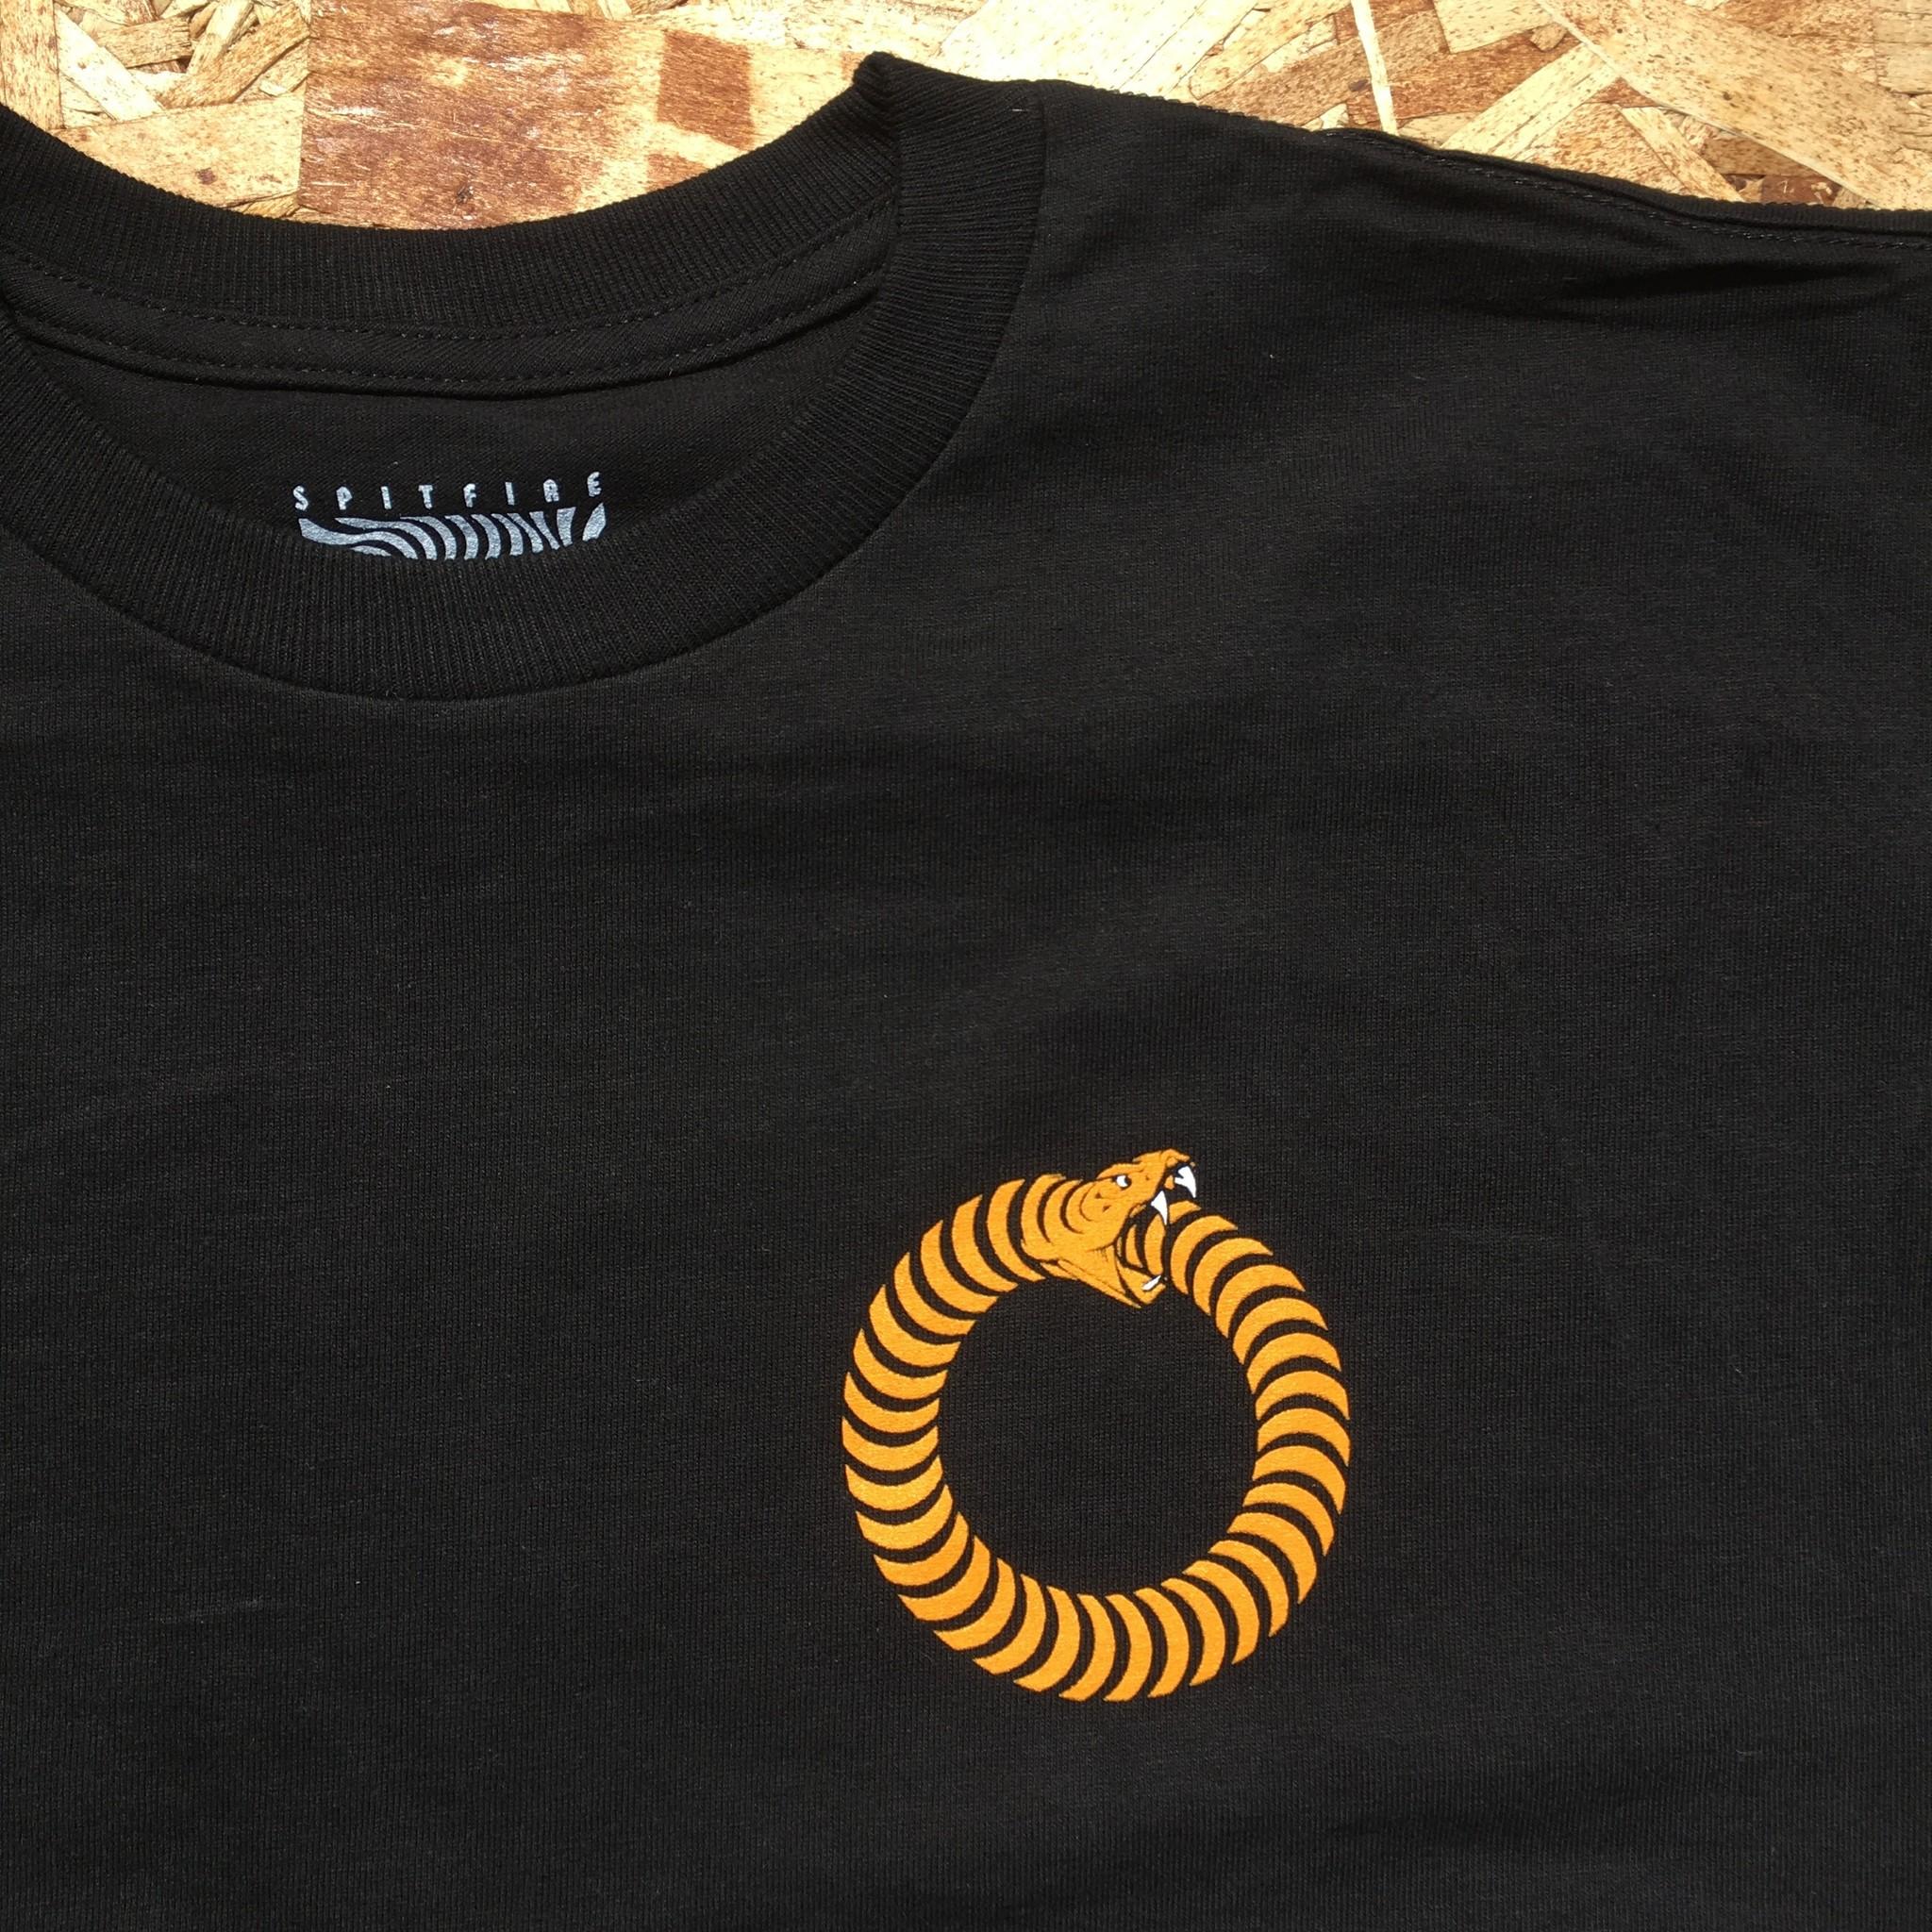 Ninetimes Ninetimes X Spitfire Ouroboros Tee - Black